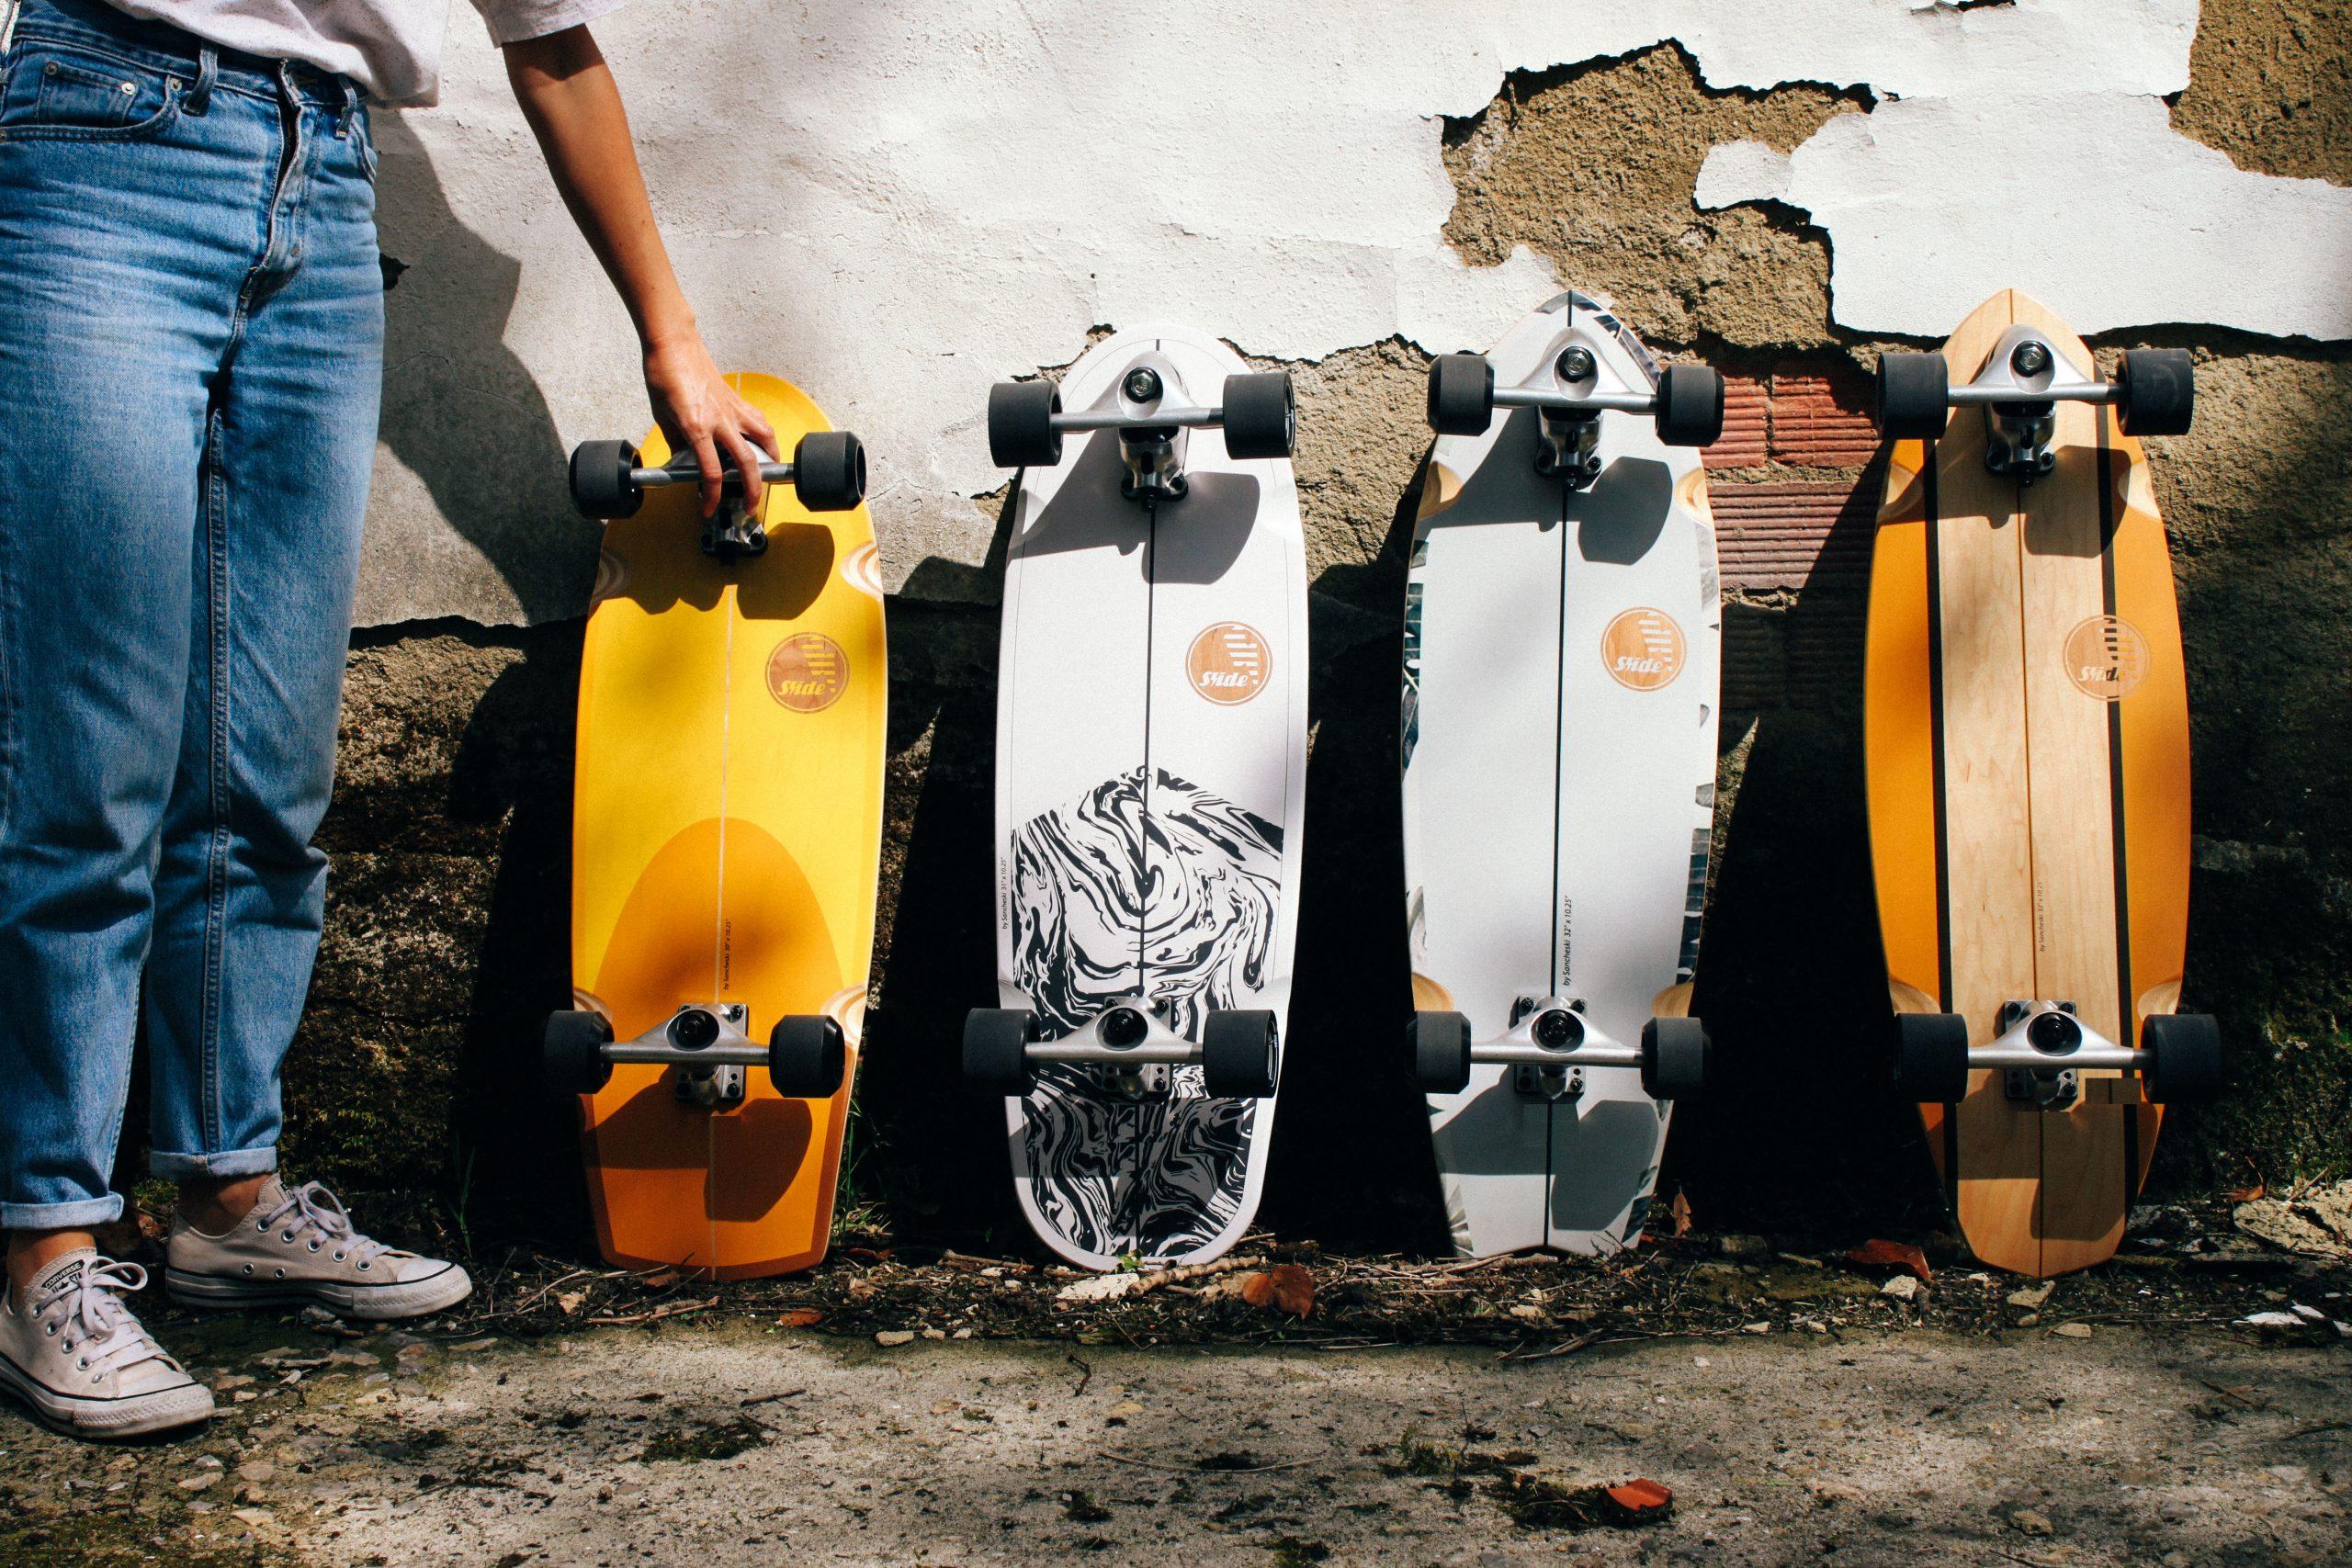 Slide 2020 surf skates